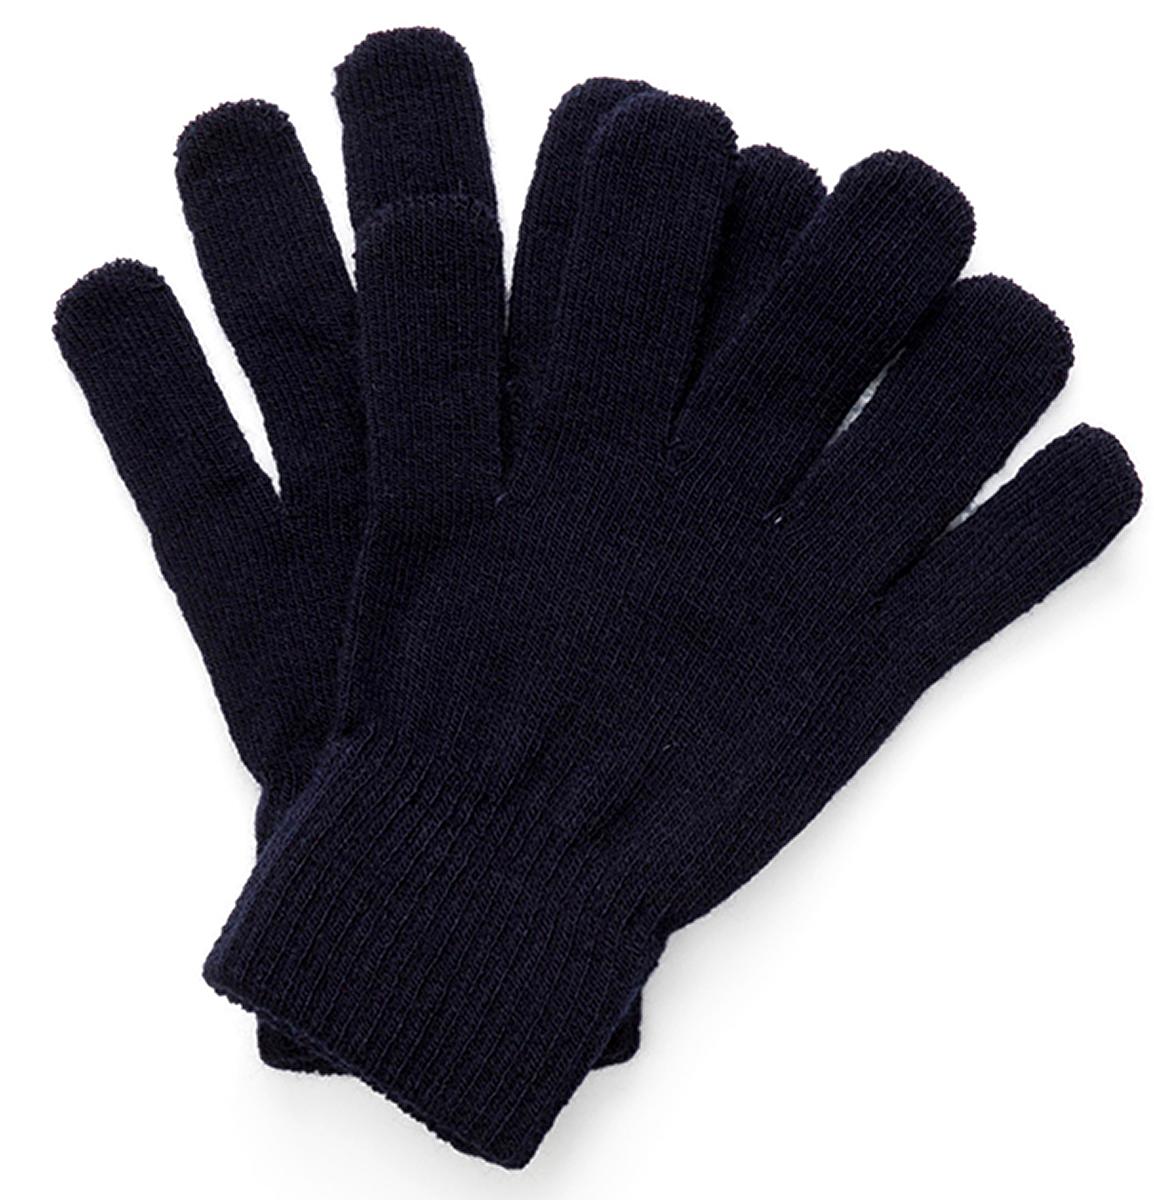 Перчатки для мальчиков Acoola Kamu, цвет: темно-синий. 20136420009. Размер L (10)20136420009